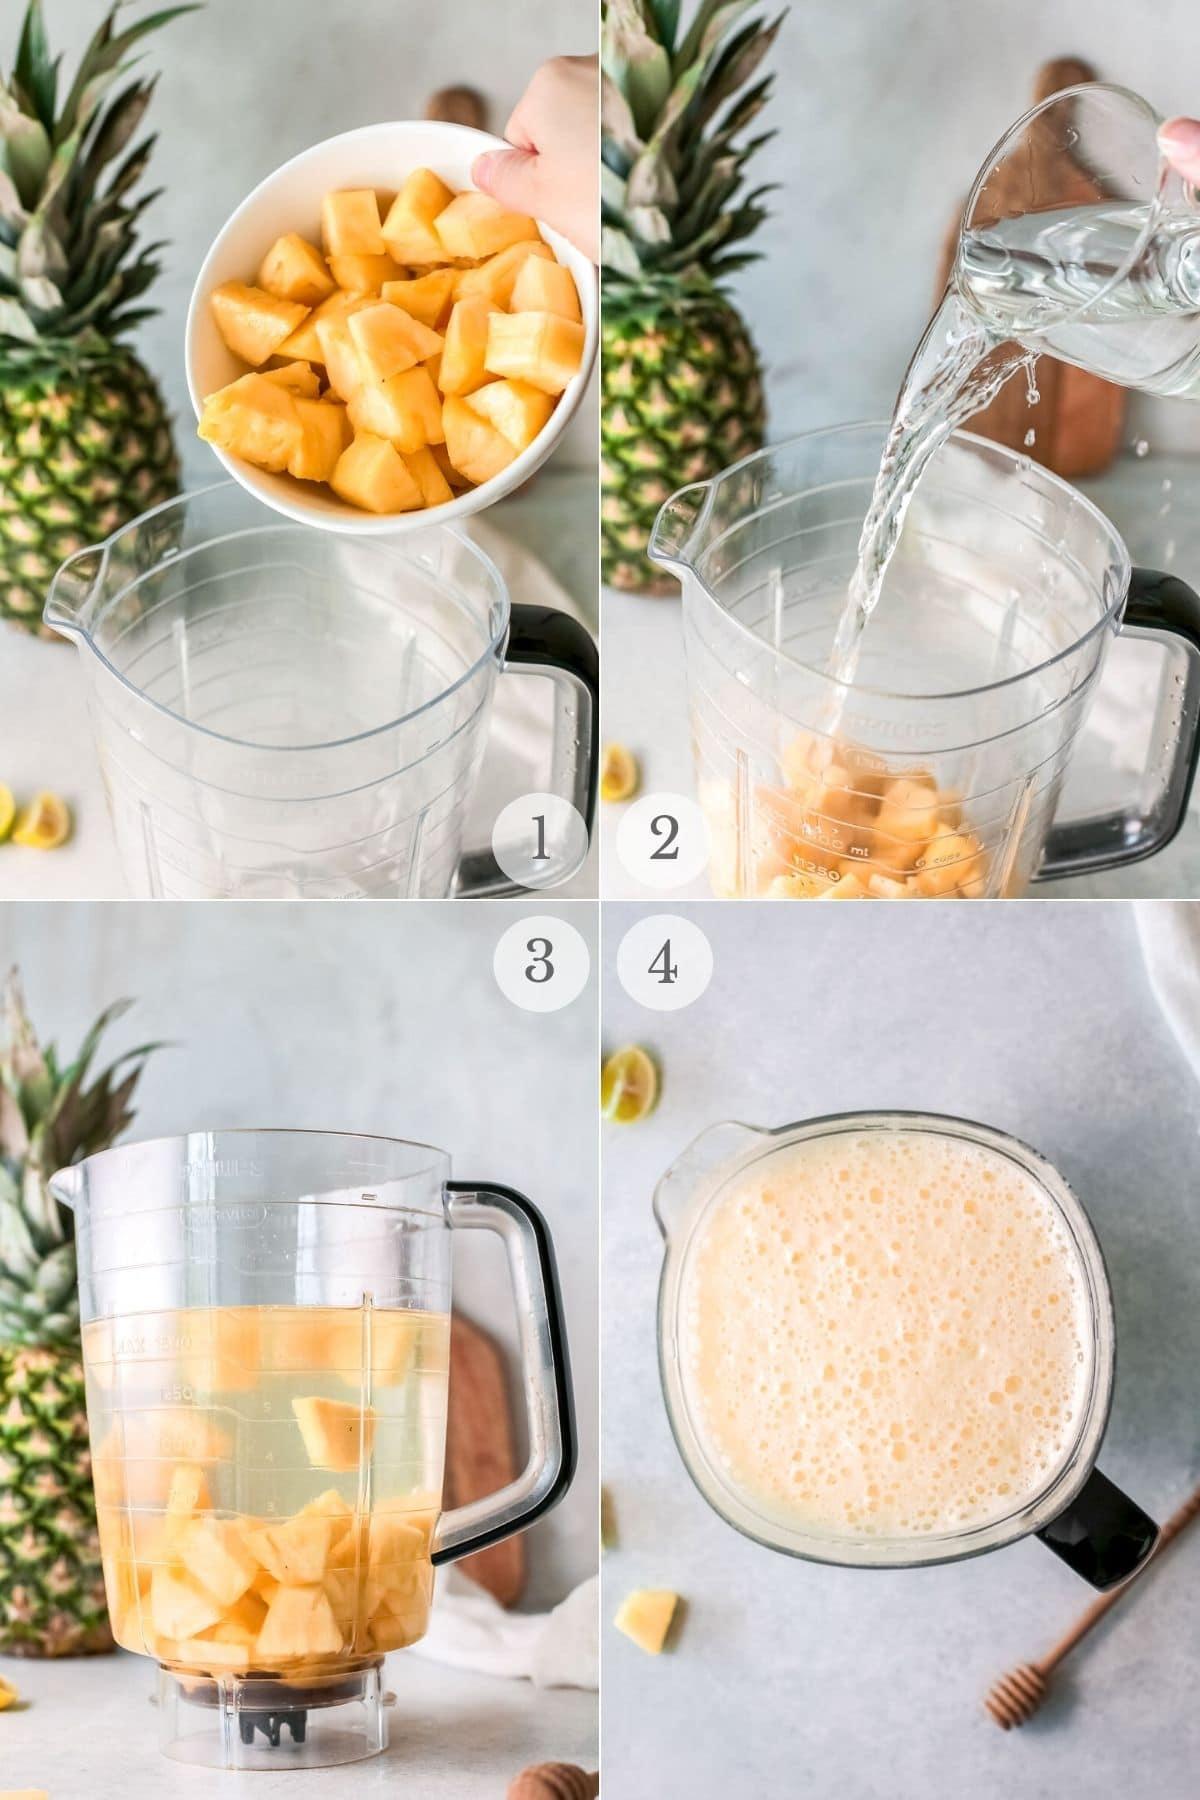 pineapple water recipe steps 1-4